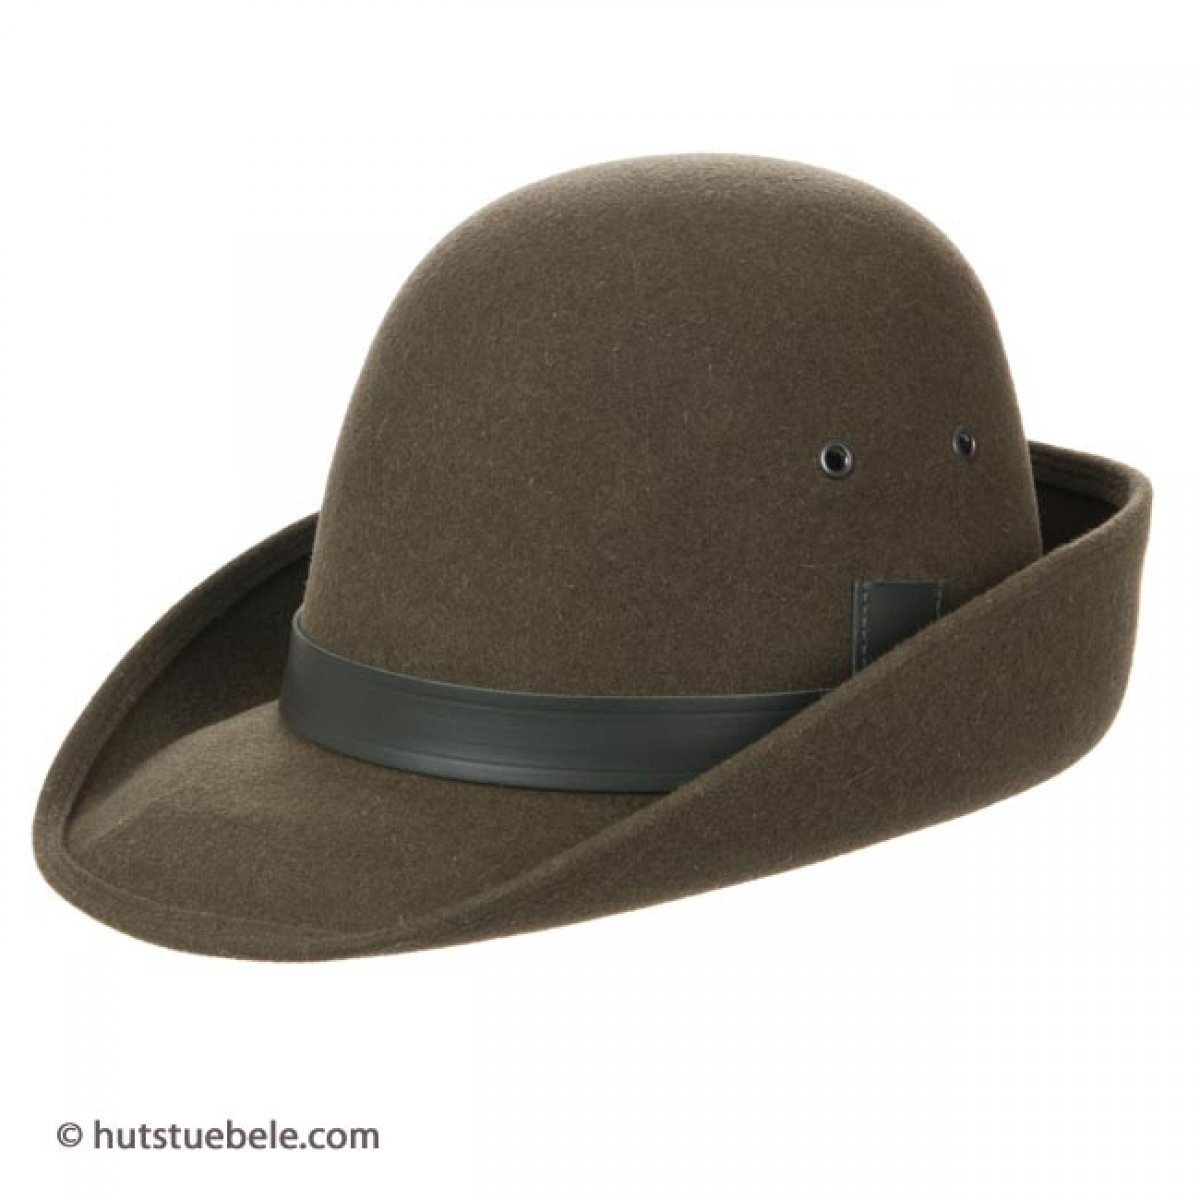 Cappello In Feltro By Hutter Eur 4290 Cappelleria eae355af65cb